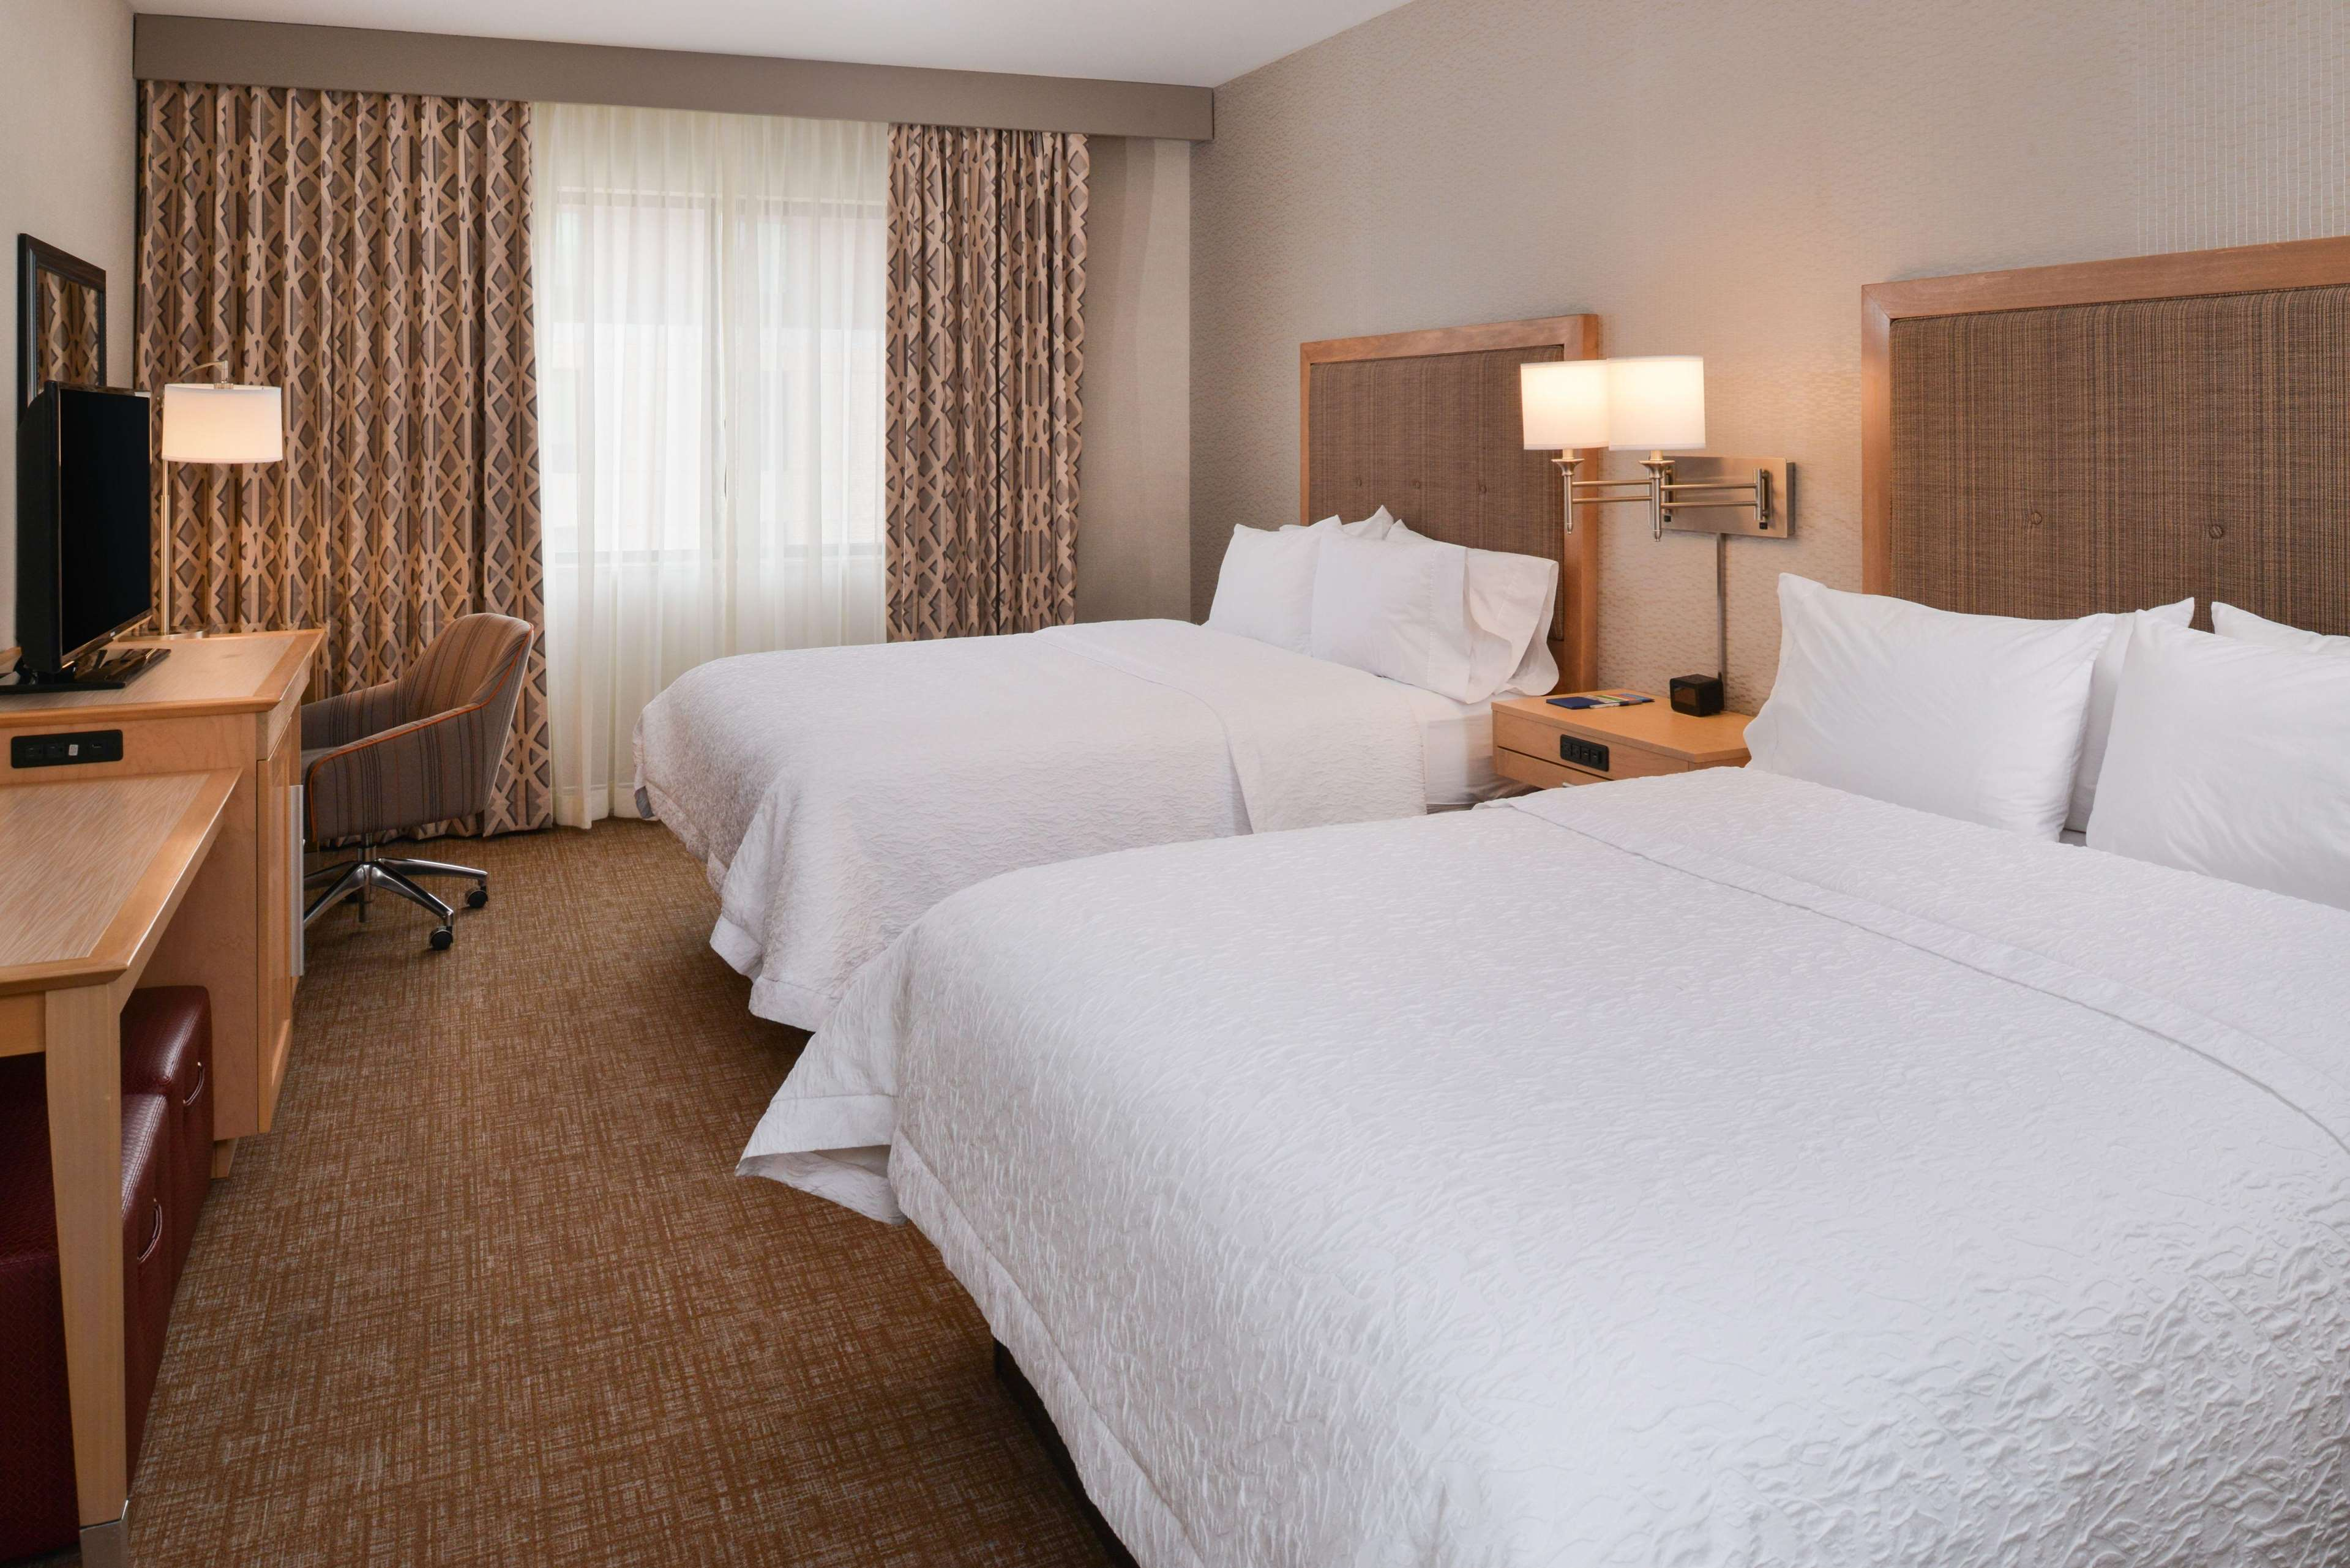 Hampton Inn & Suites Denver-Speer Boulevard image 47